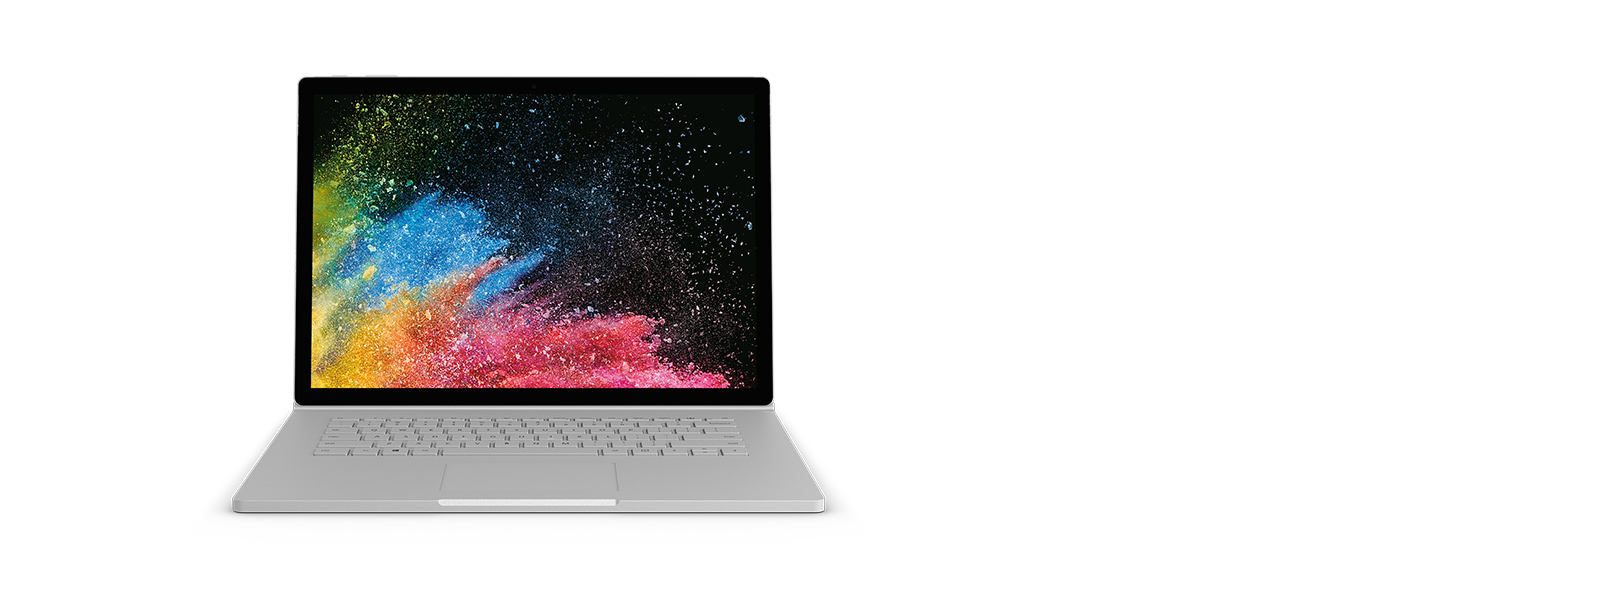 Surface Book 2 im Laptop-Modus mit Screenshot.